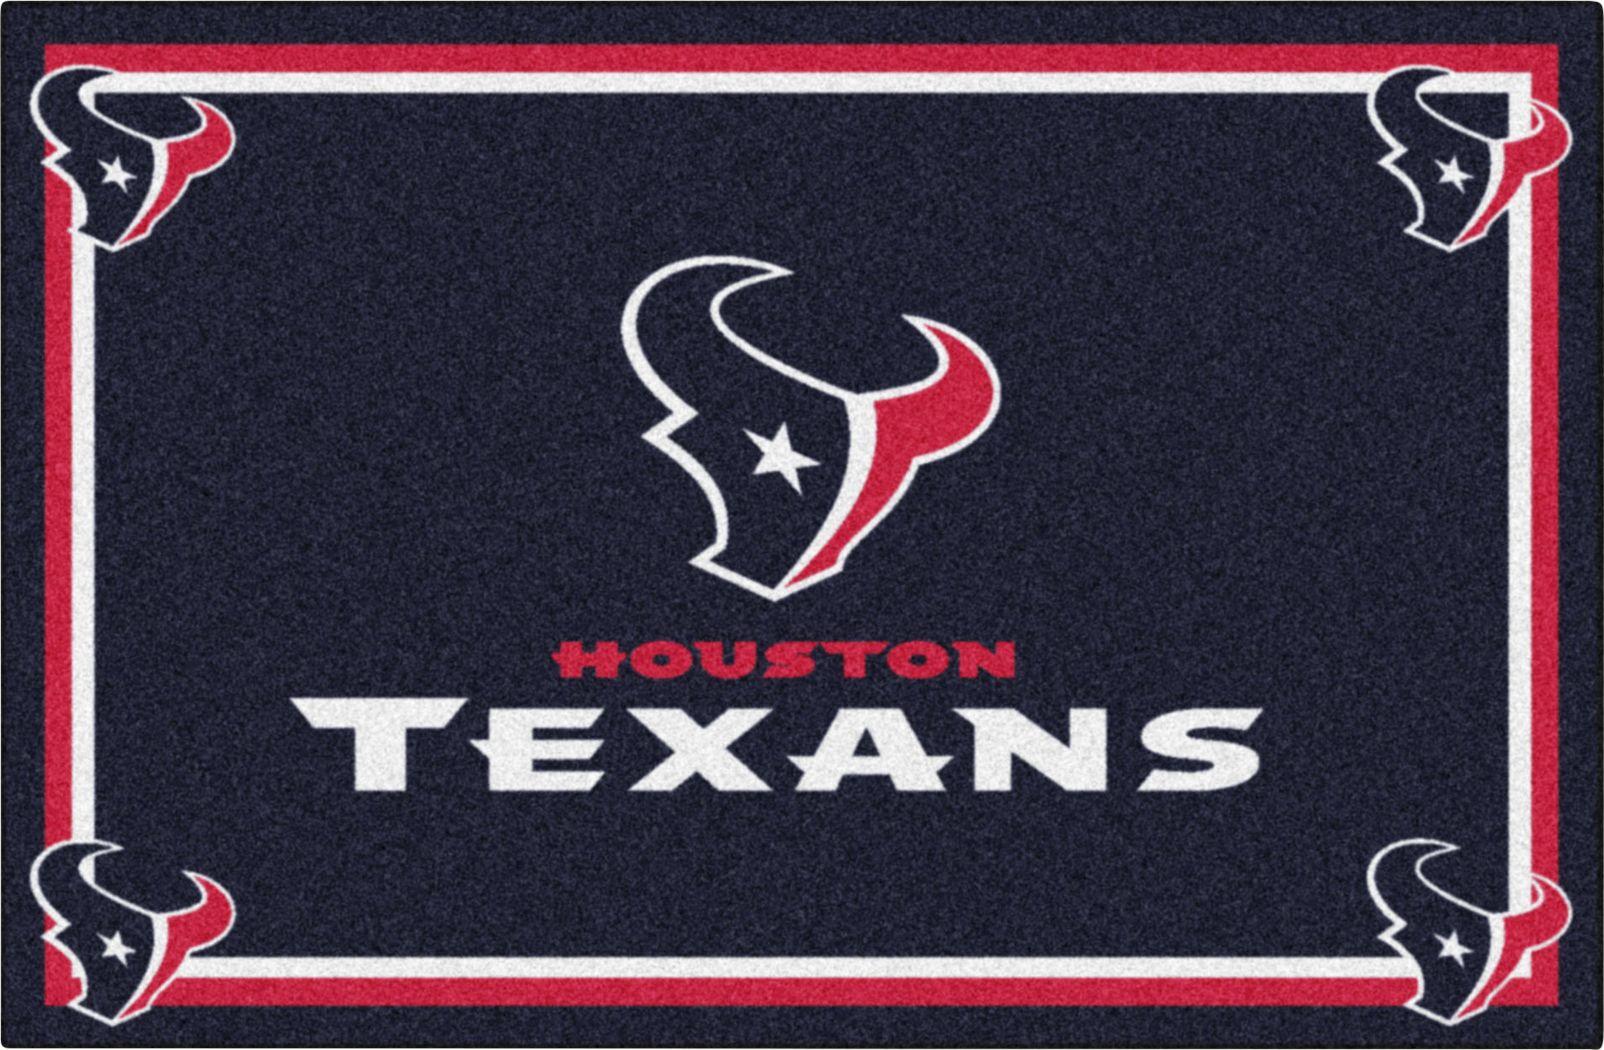 NFL Big Game Houston Texans 5' x 8' Rug